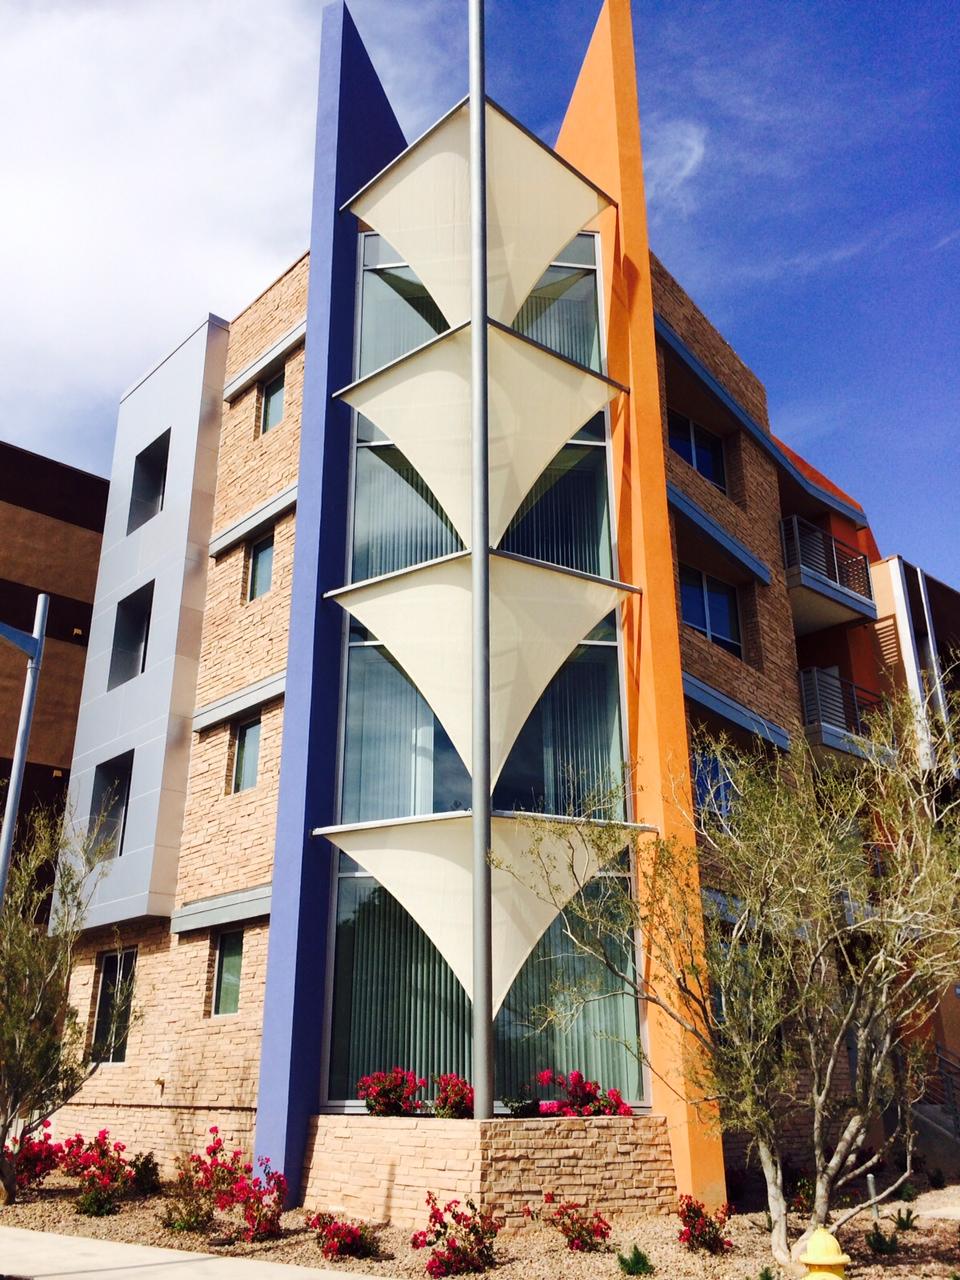 Sky Song Apartments in Scottsdale Arizona